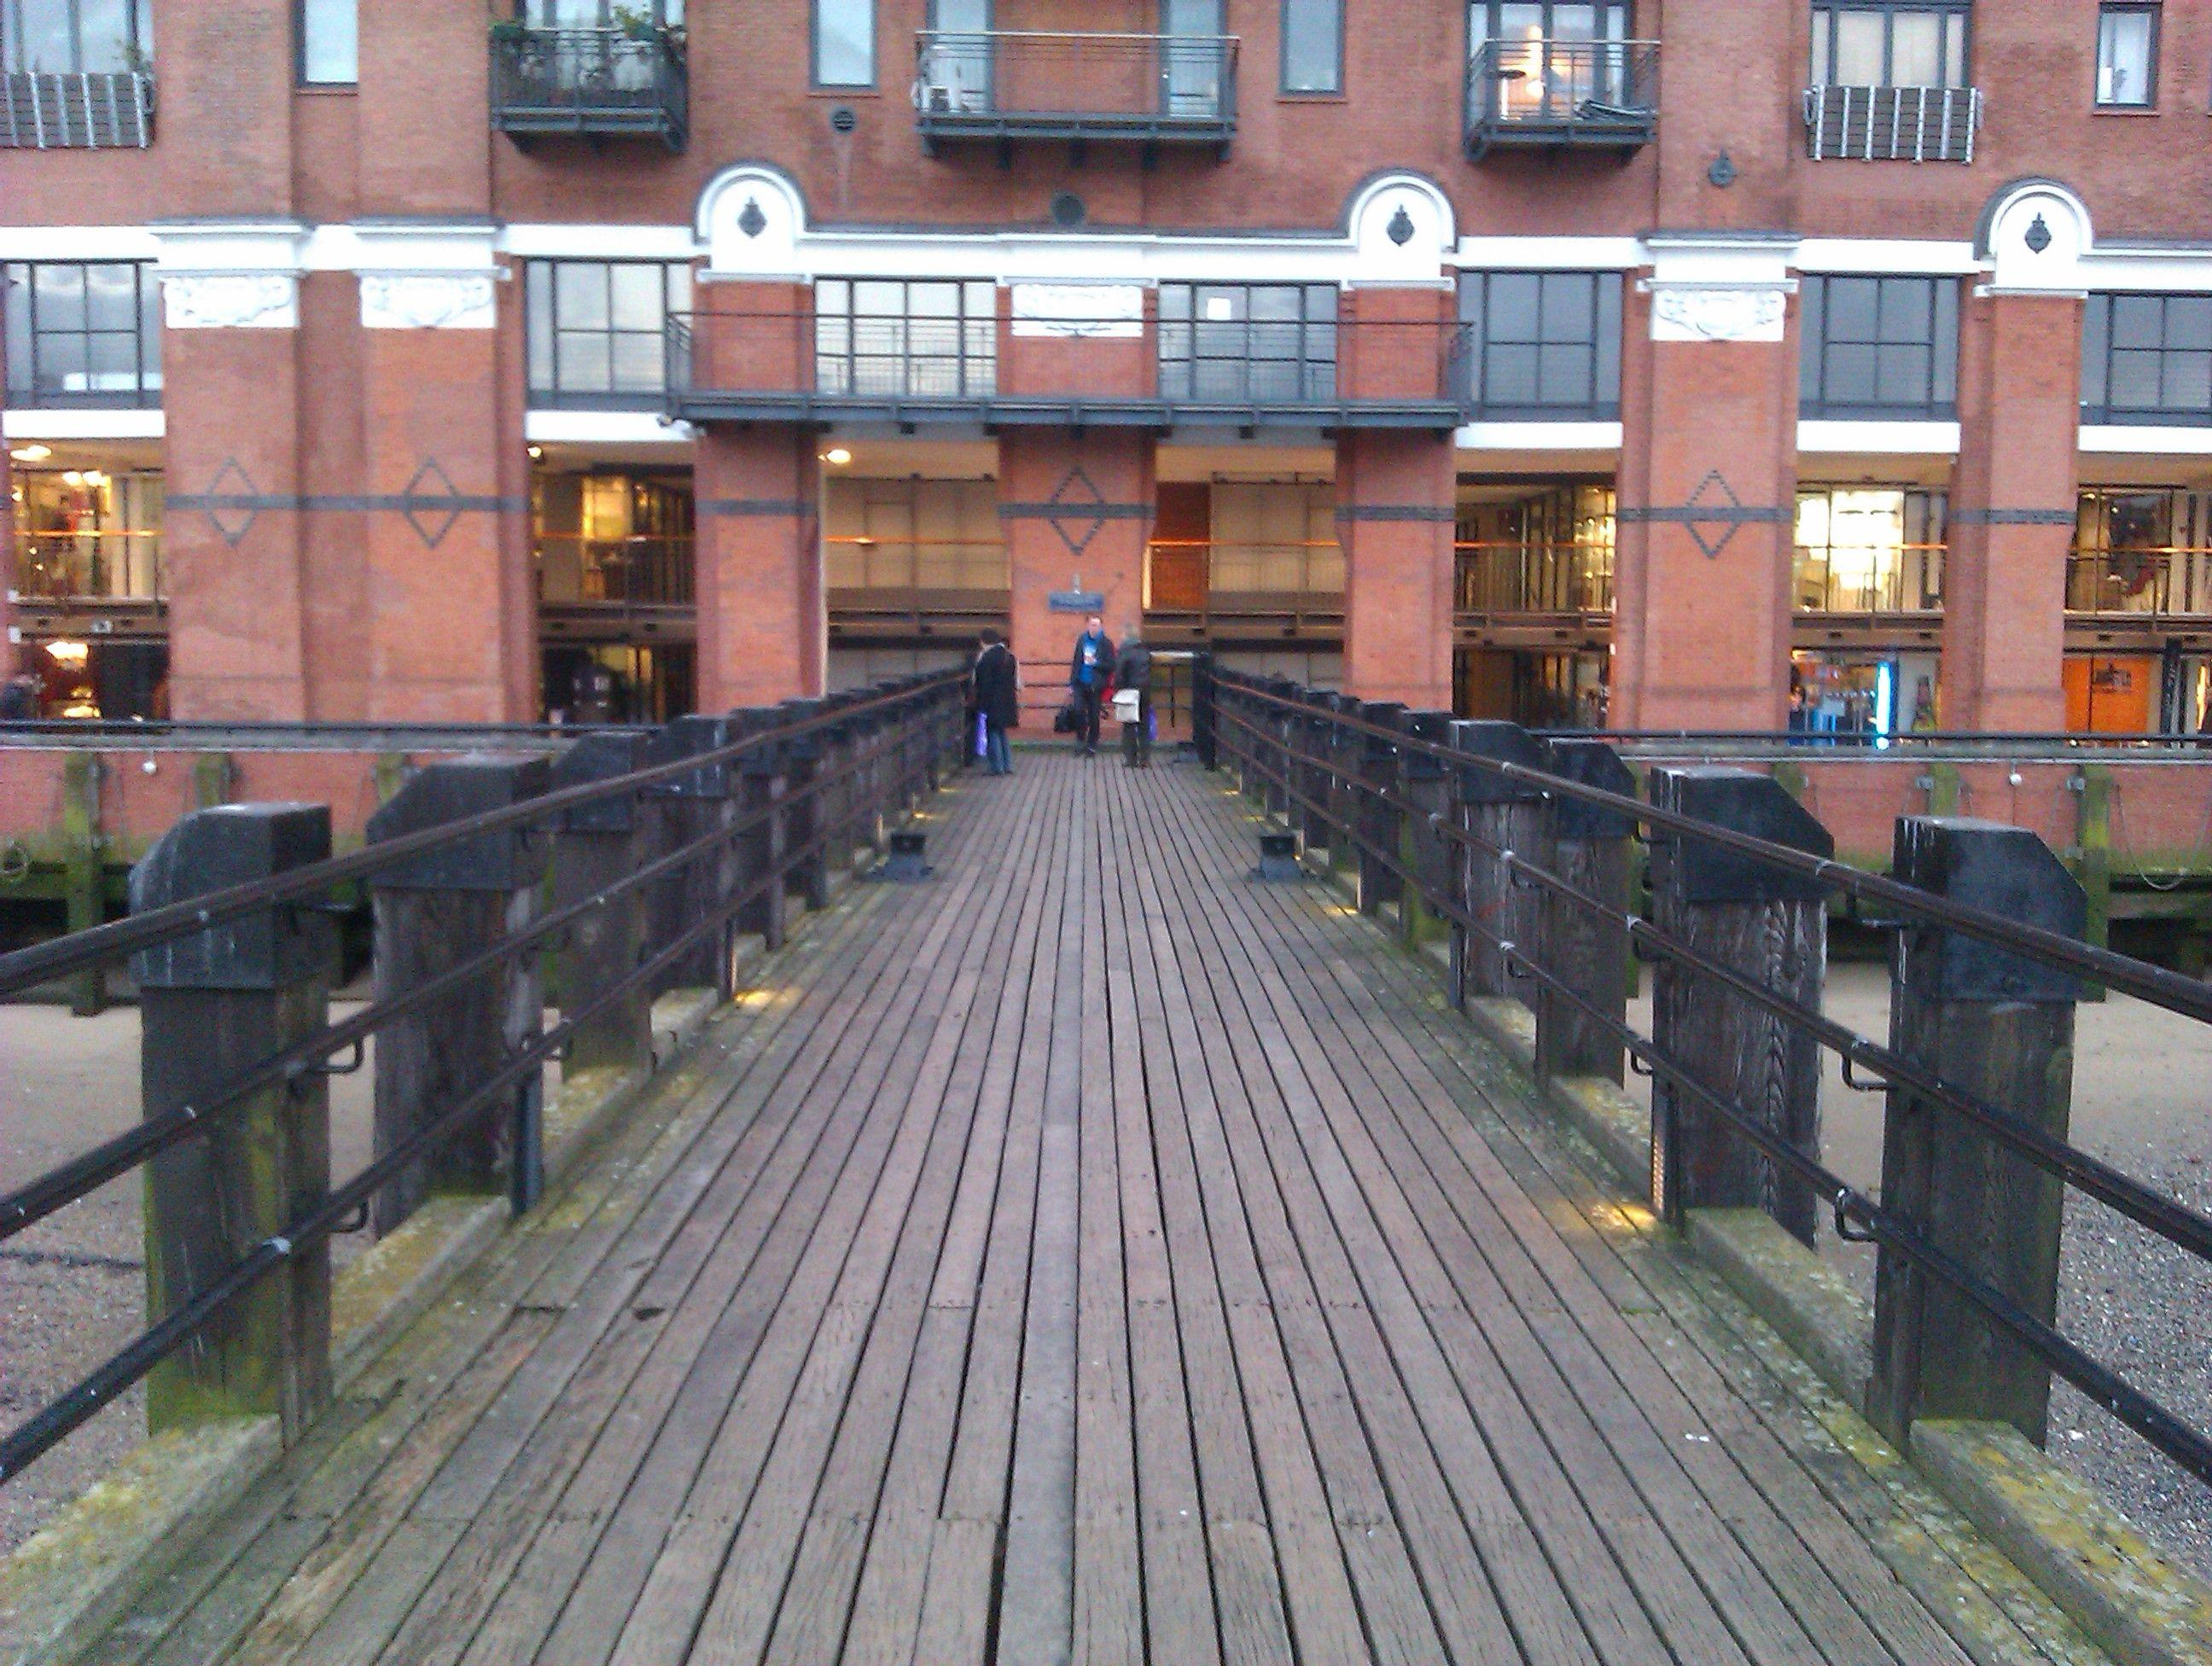 OXO Building pier